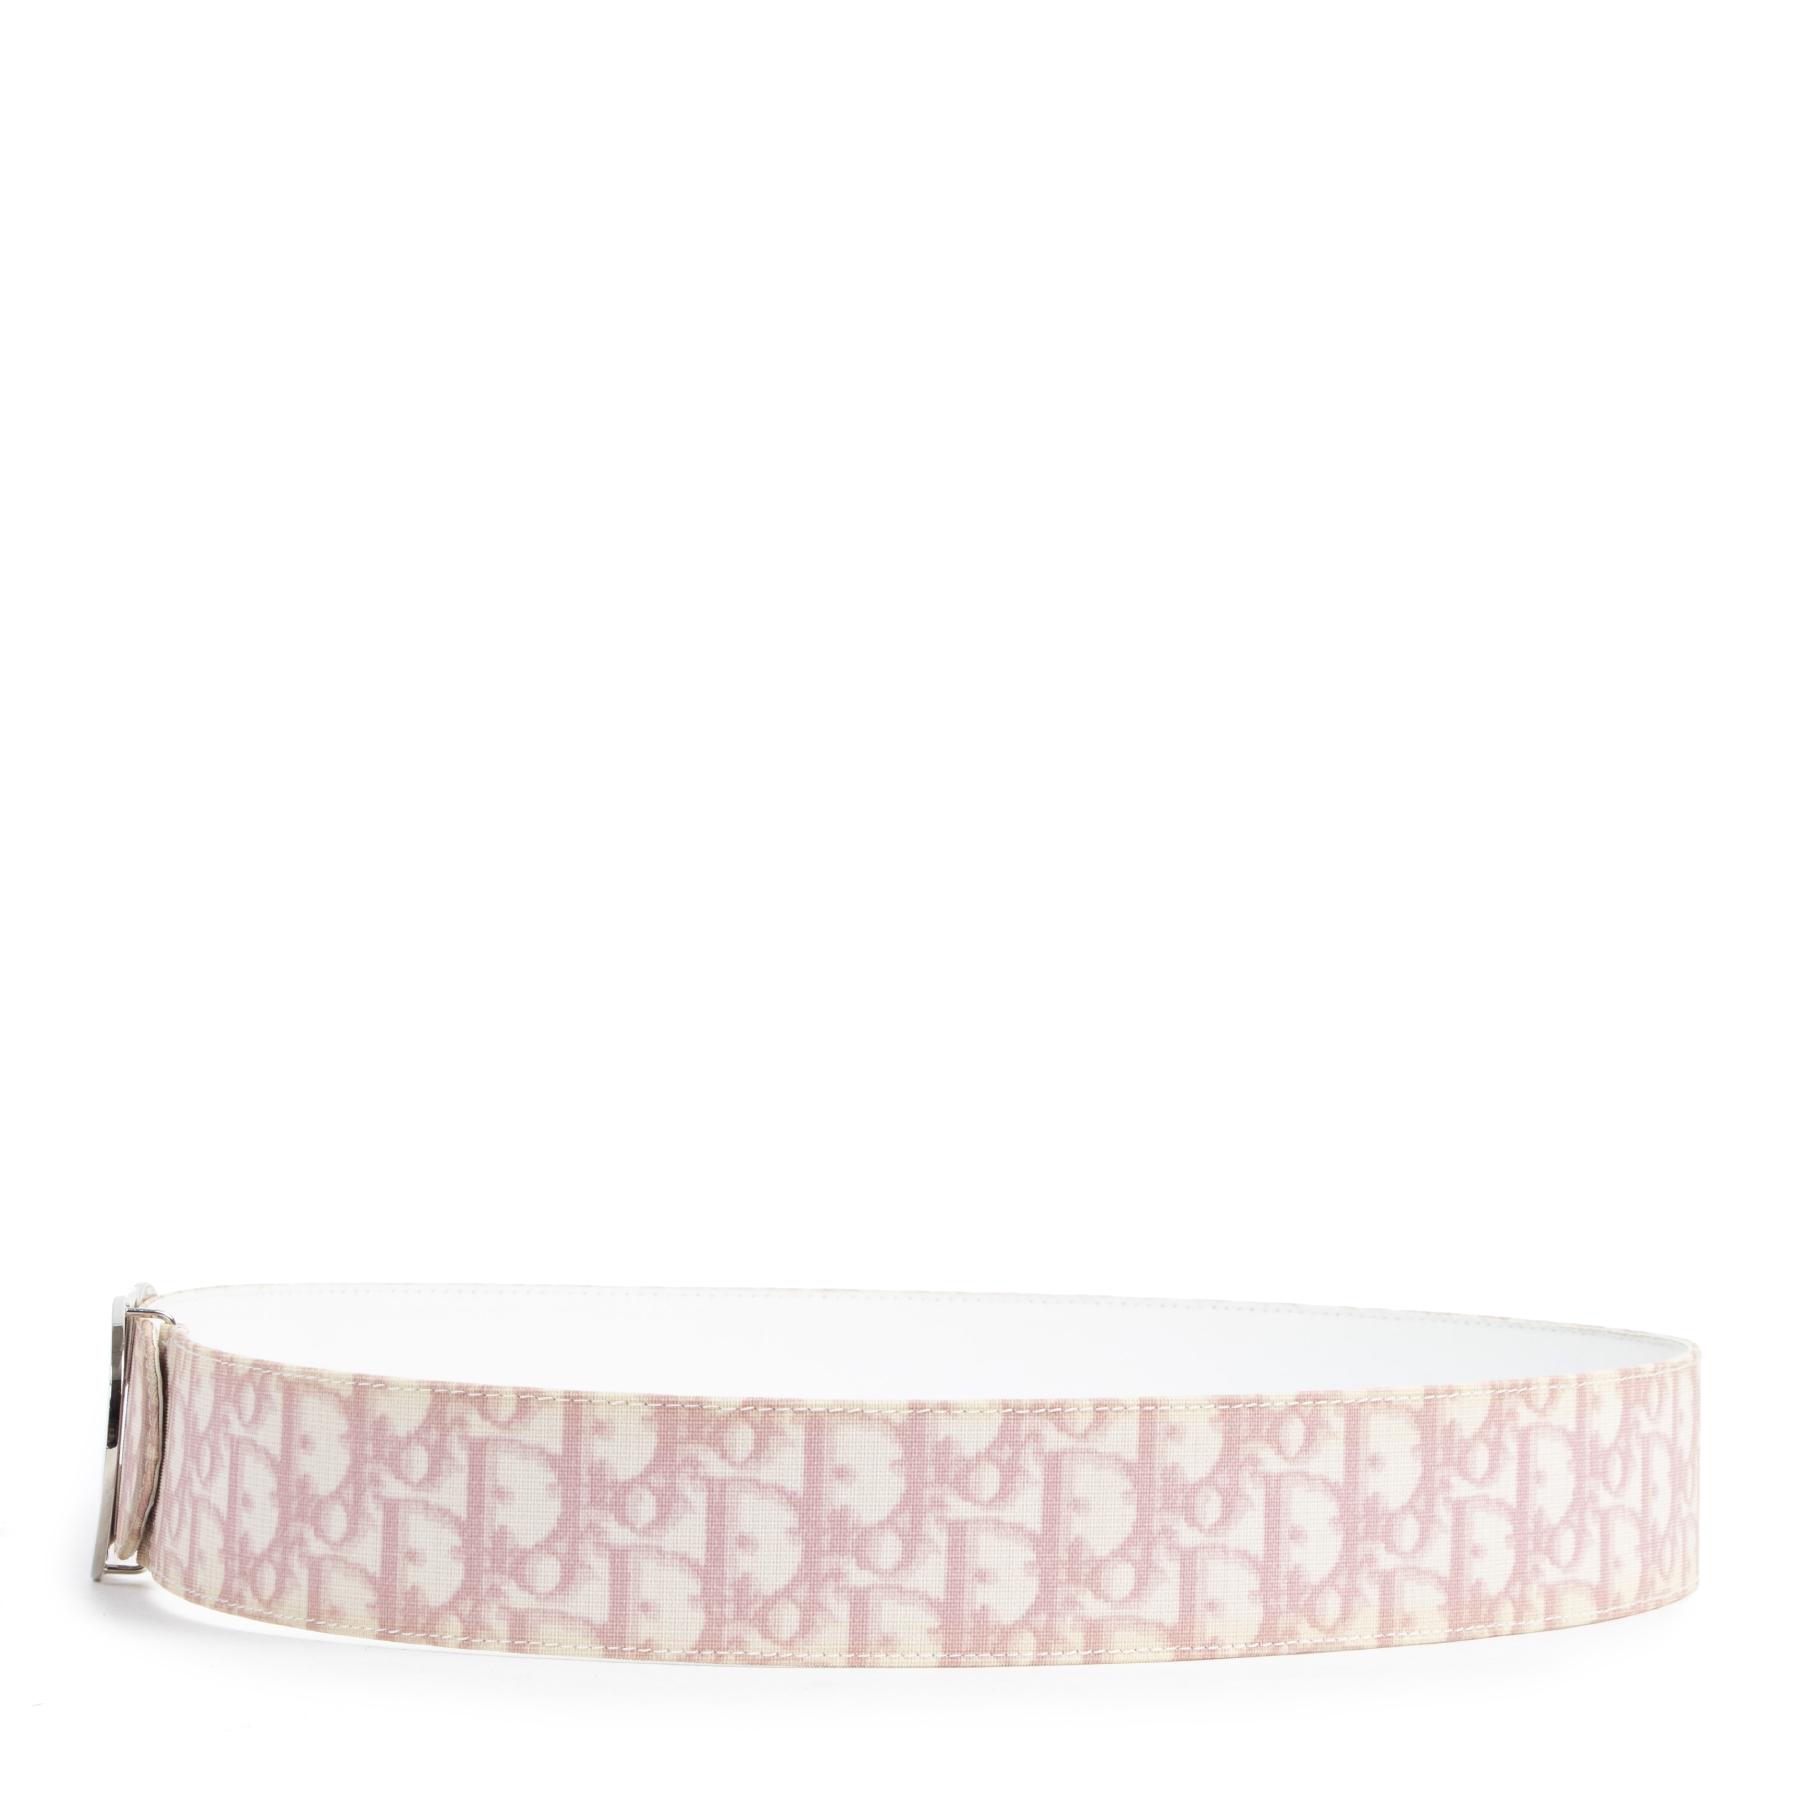 Authentieke tweedehands vintage Dior Pink Monogram Belt - Size 95 cm koop online webshop LabelLOV